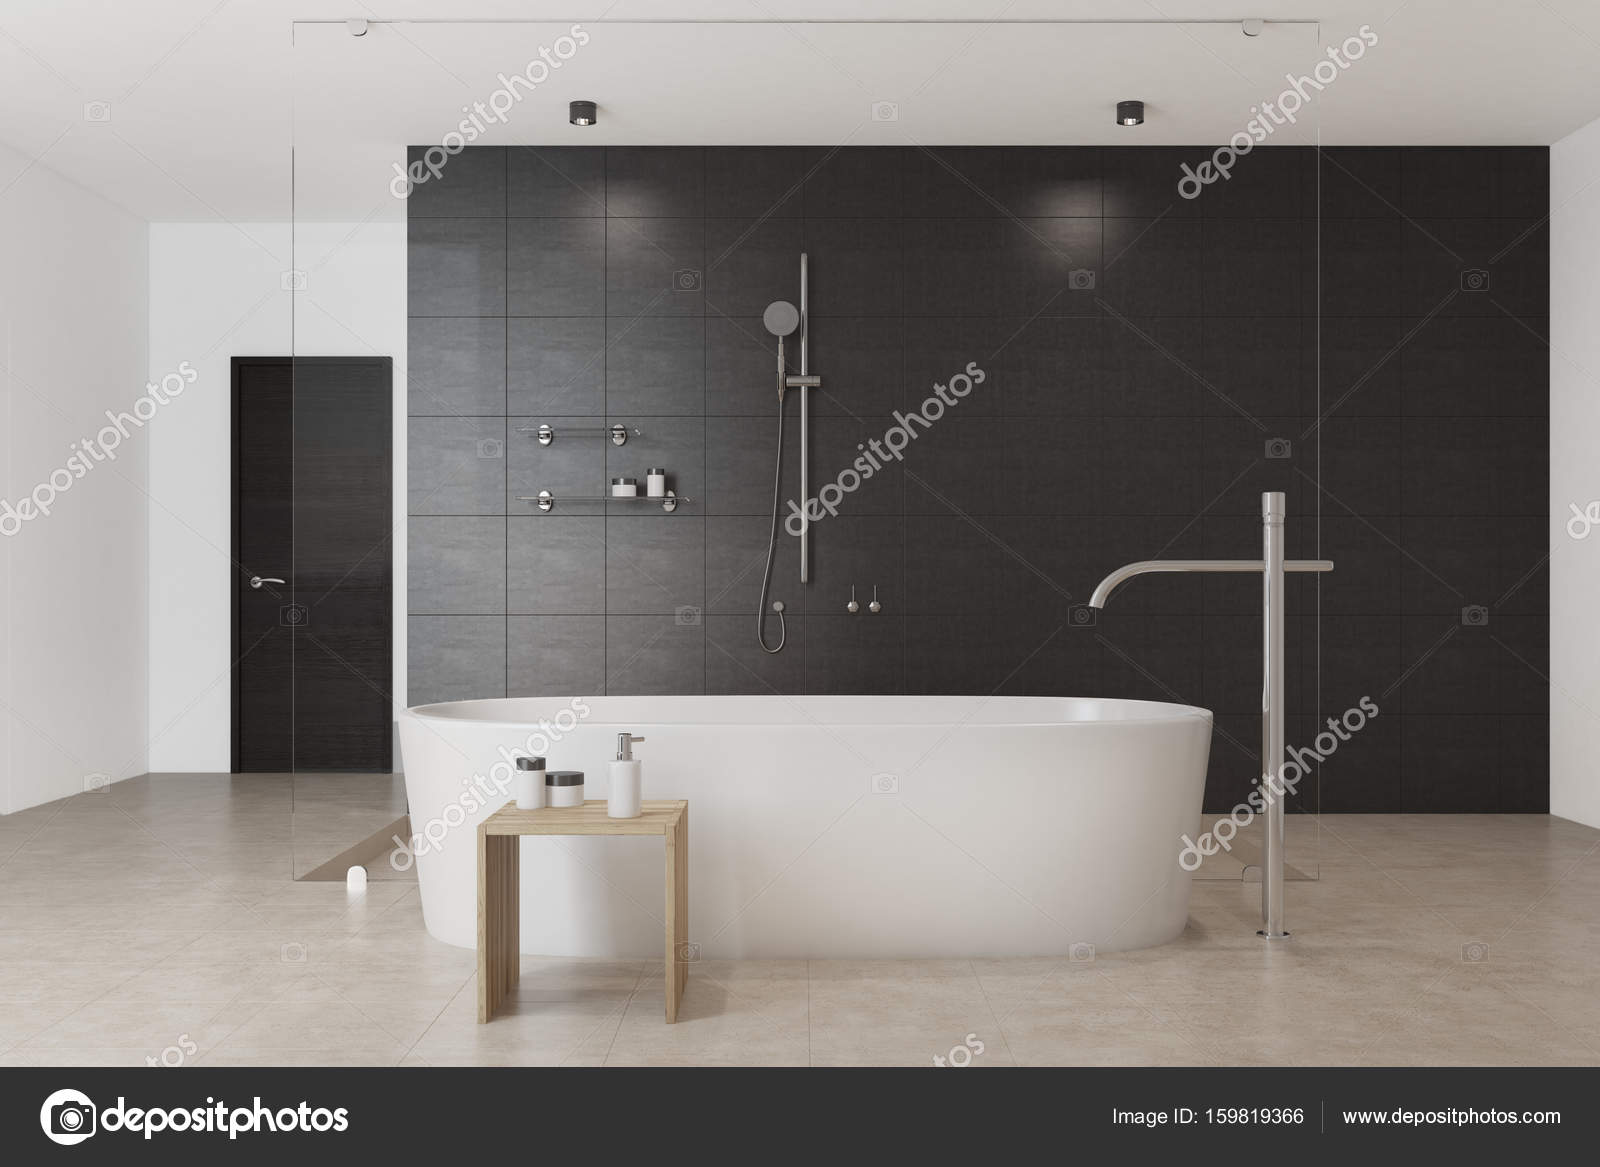 Vasca Da Bagno Nera : Nero interno bianco vasca da bagno anteriore u2014 foto stock